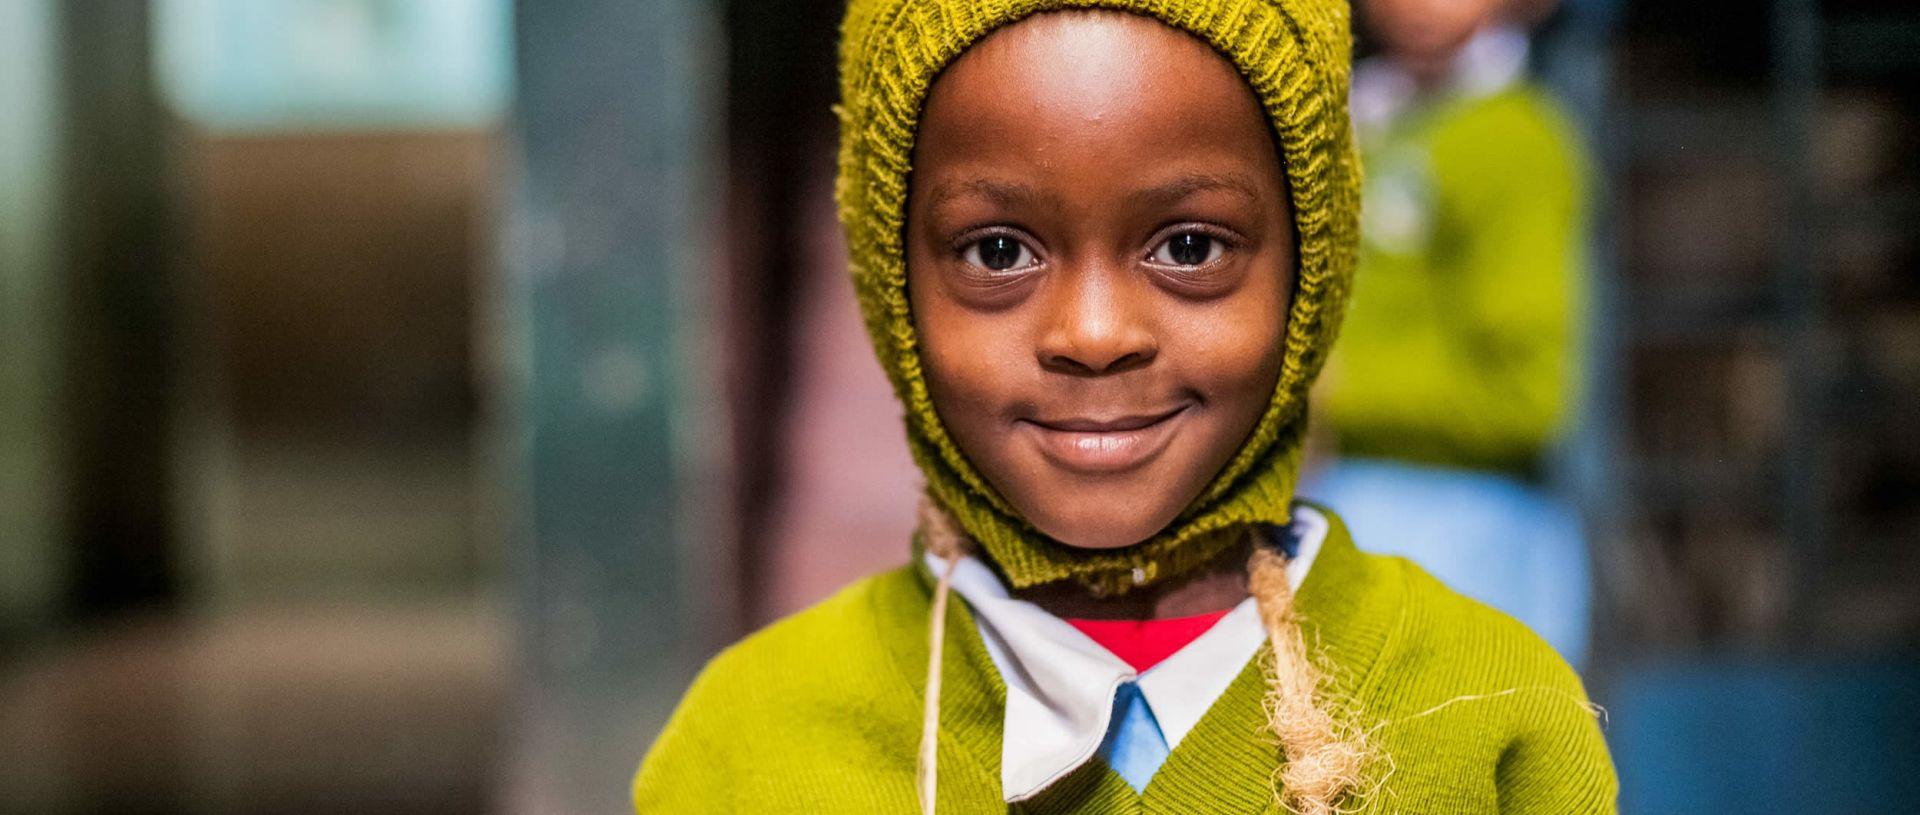 hope in the slums of Nairobi banner